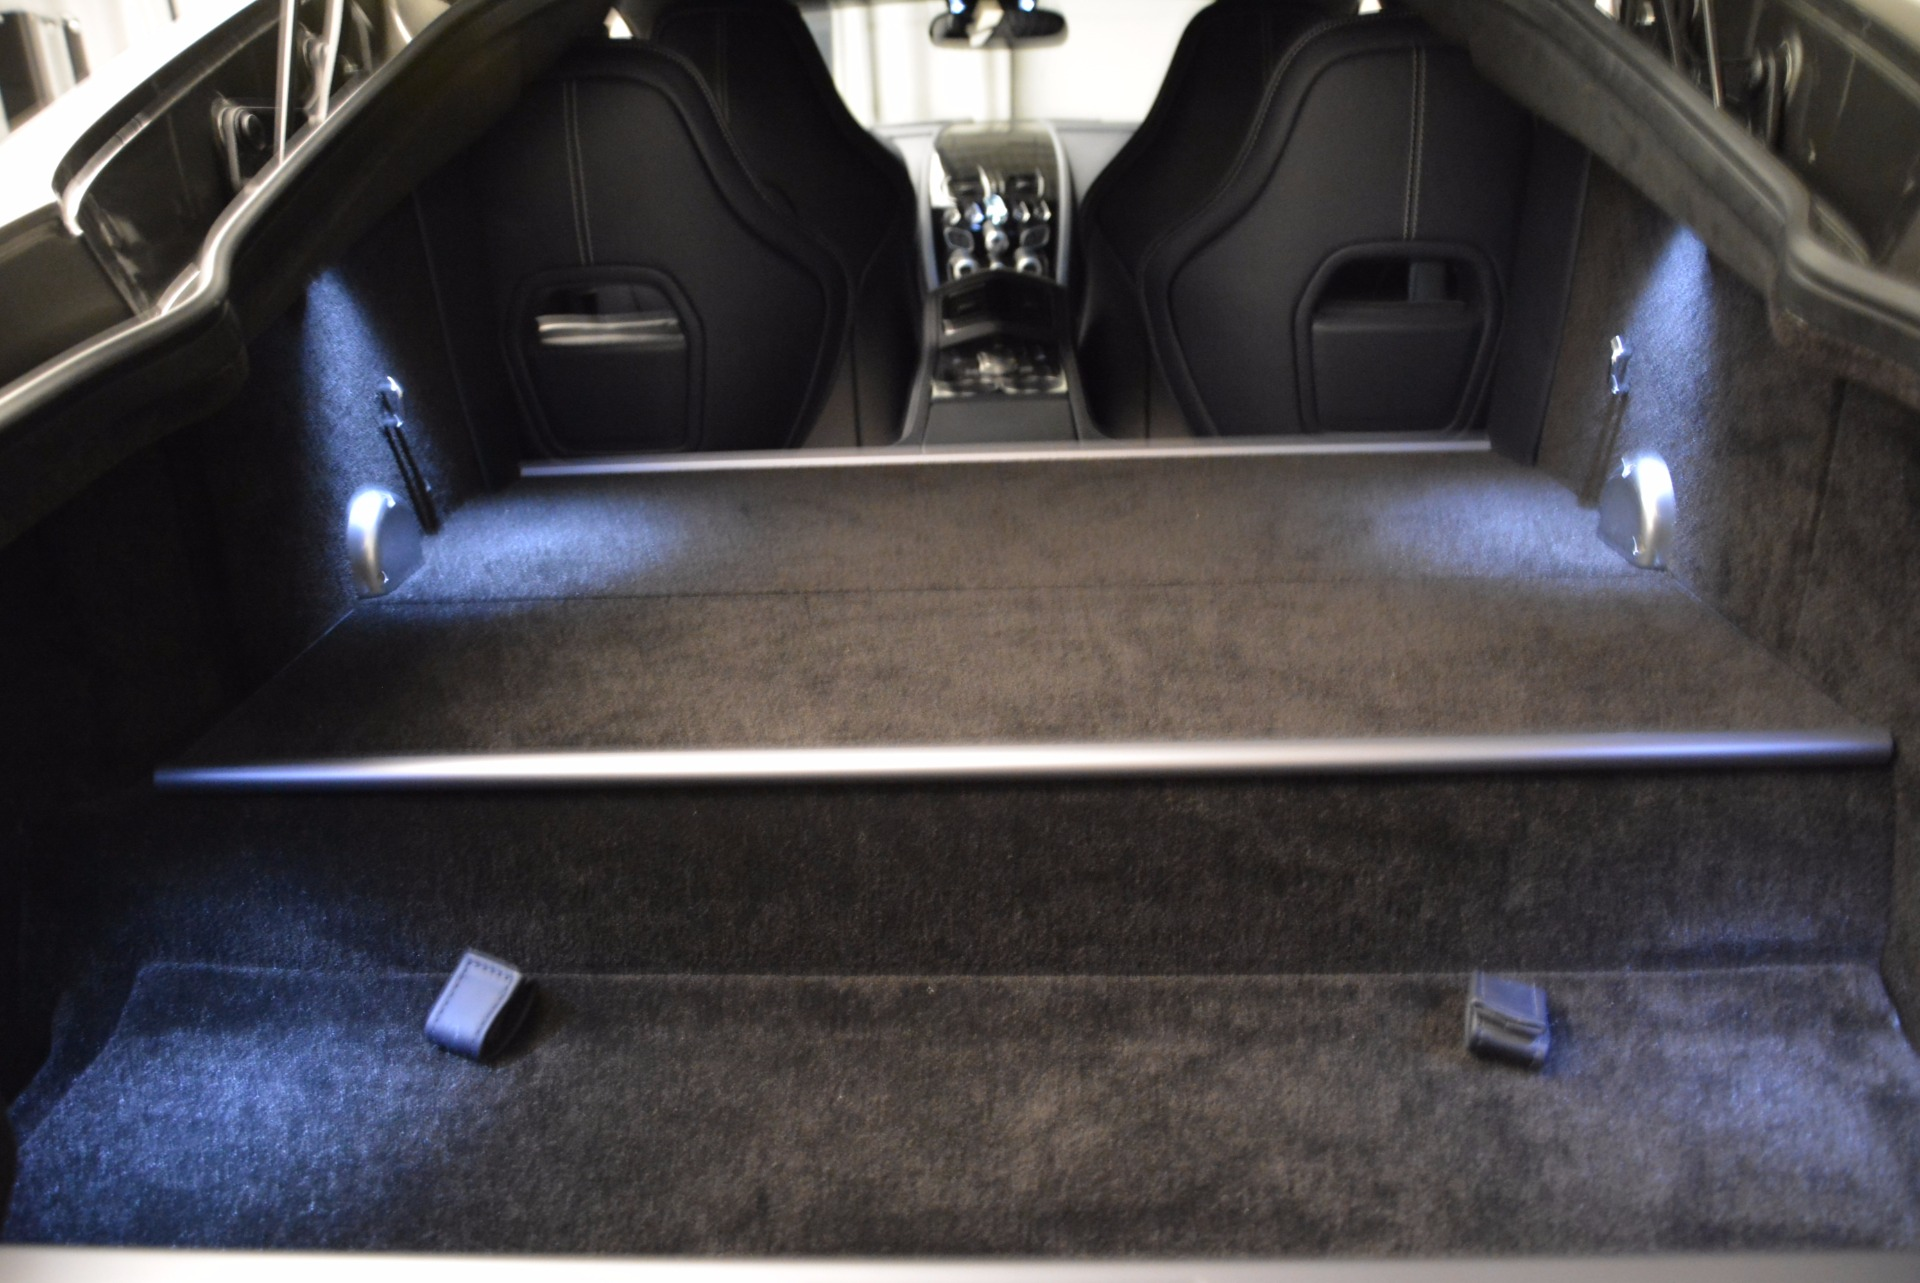 Used 2017 Aston Martin Rapide S Sedan For Sale In Greenwich, CT 1843_p21